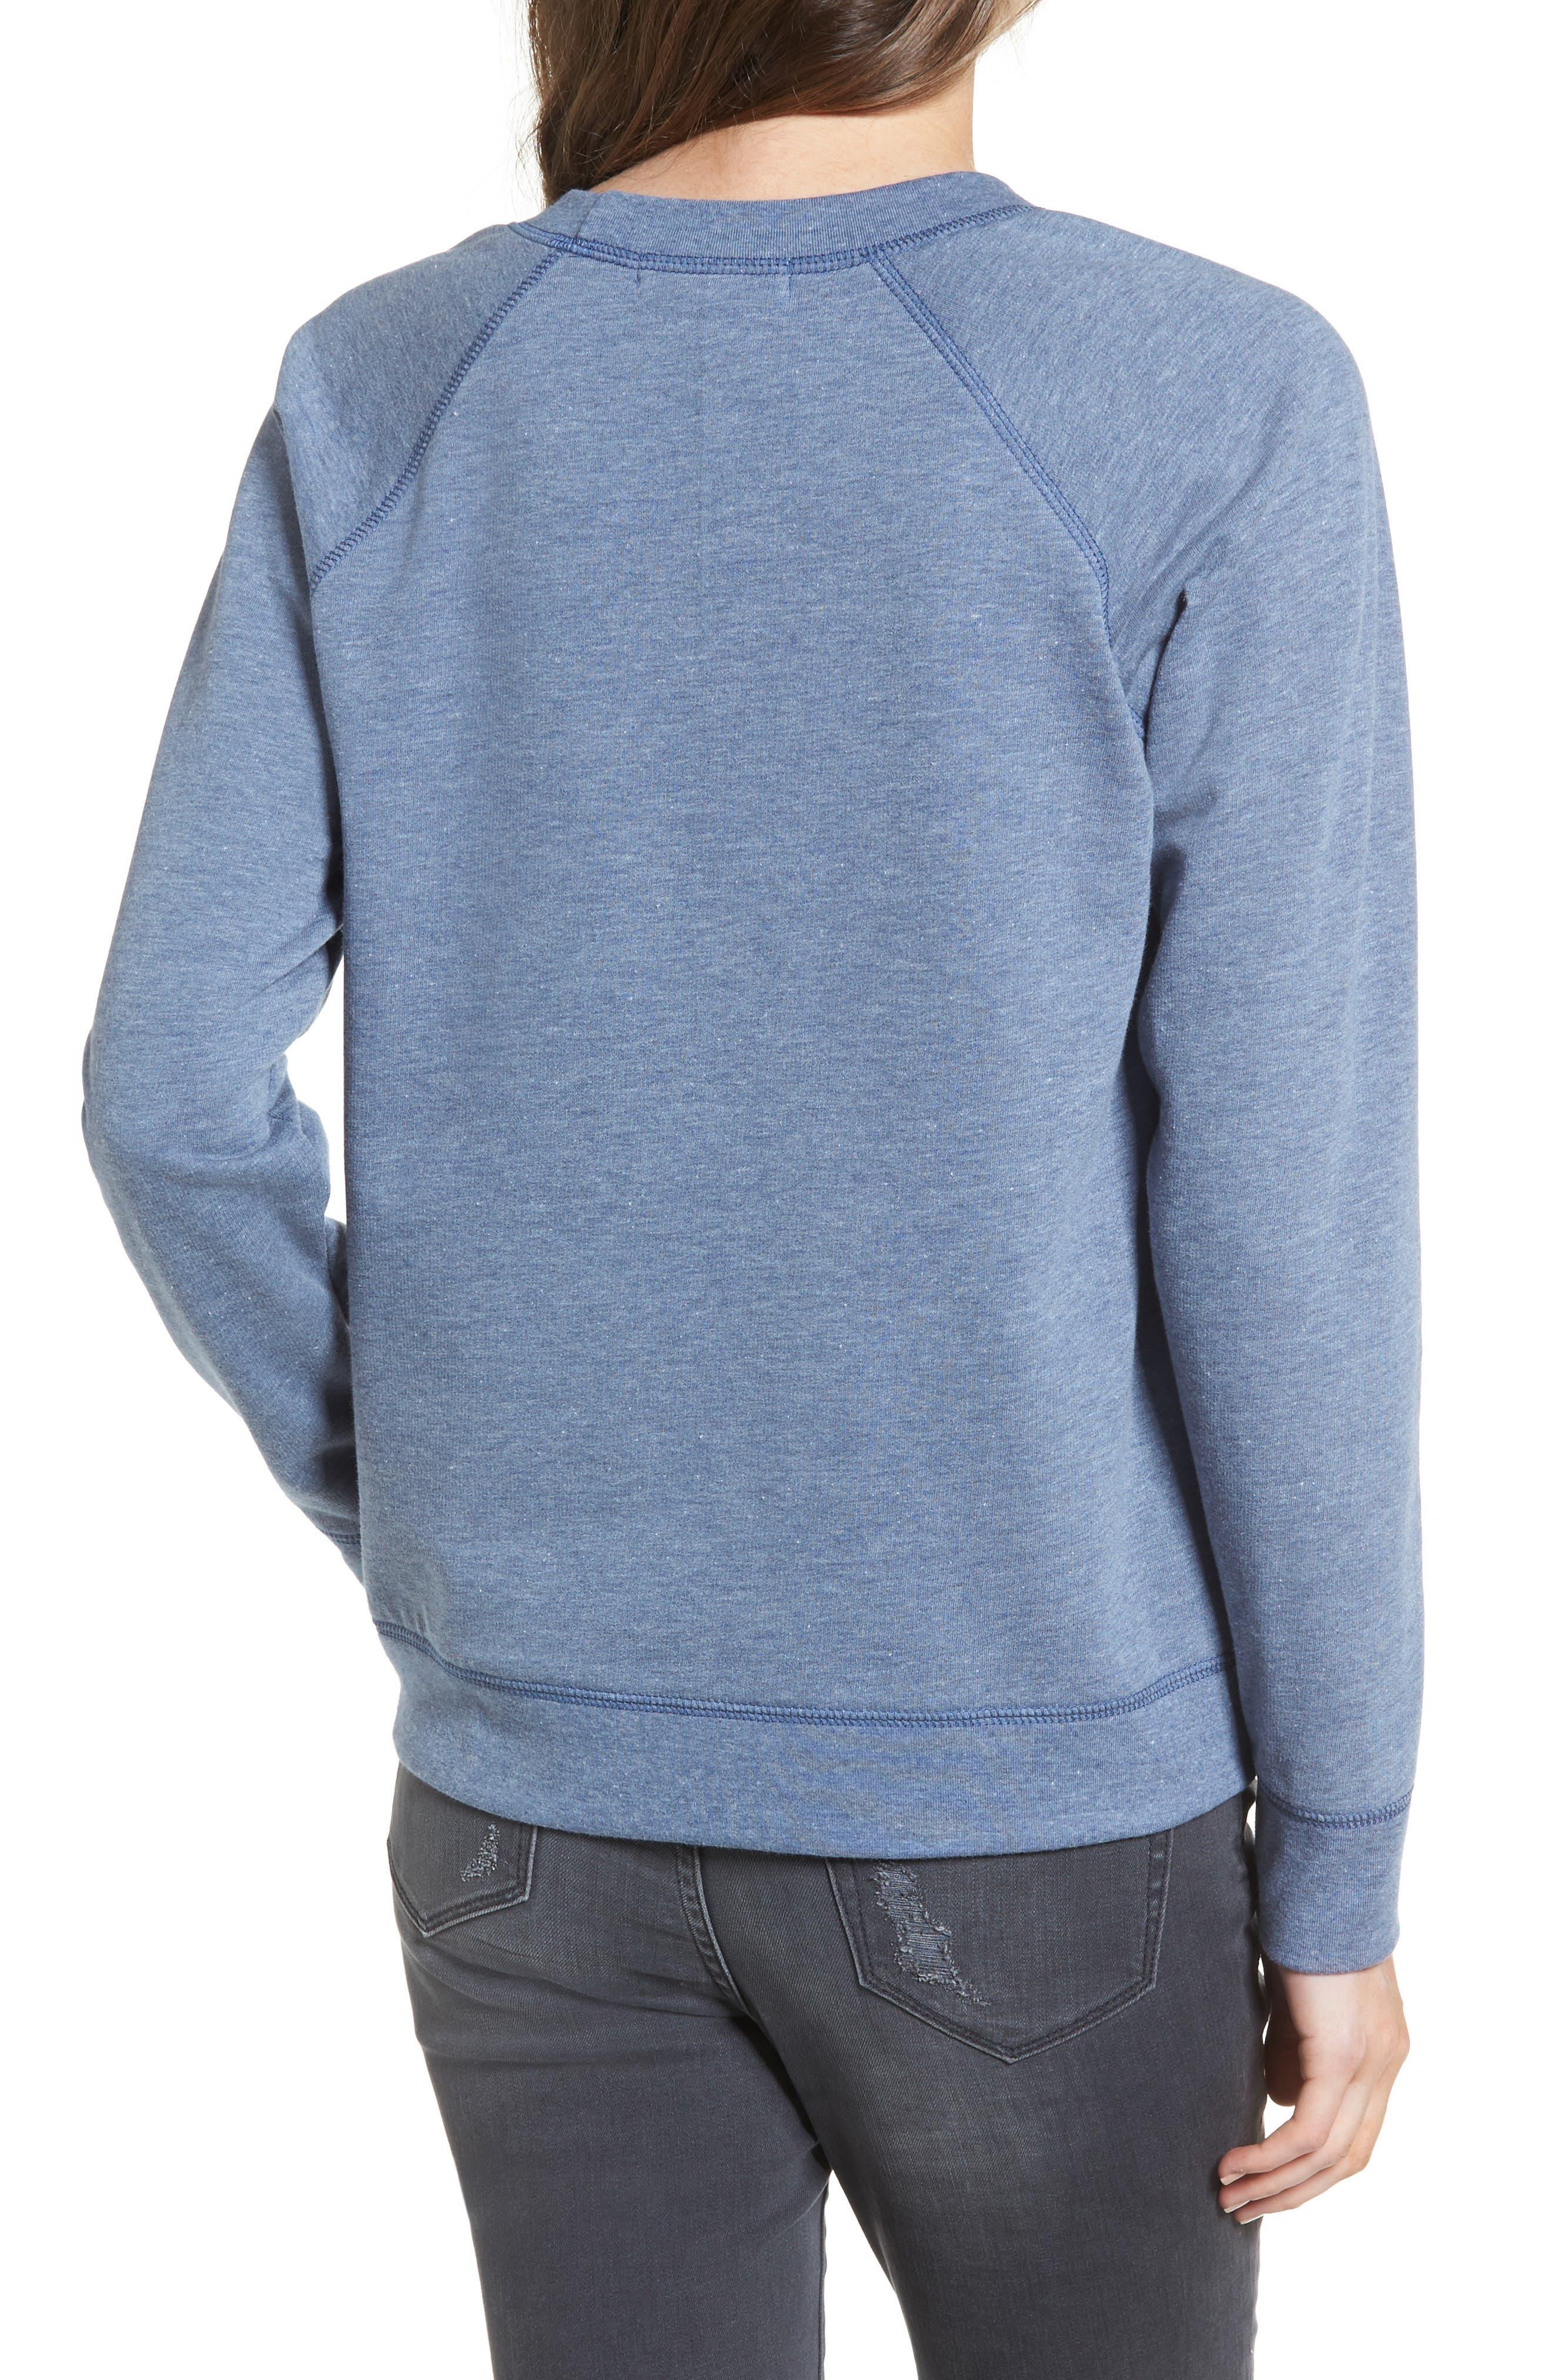 Crewneck Sweatshirt,                             Alternate thumbnail 2, color,                             Blue Insignia Treasure